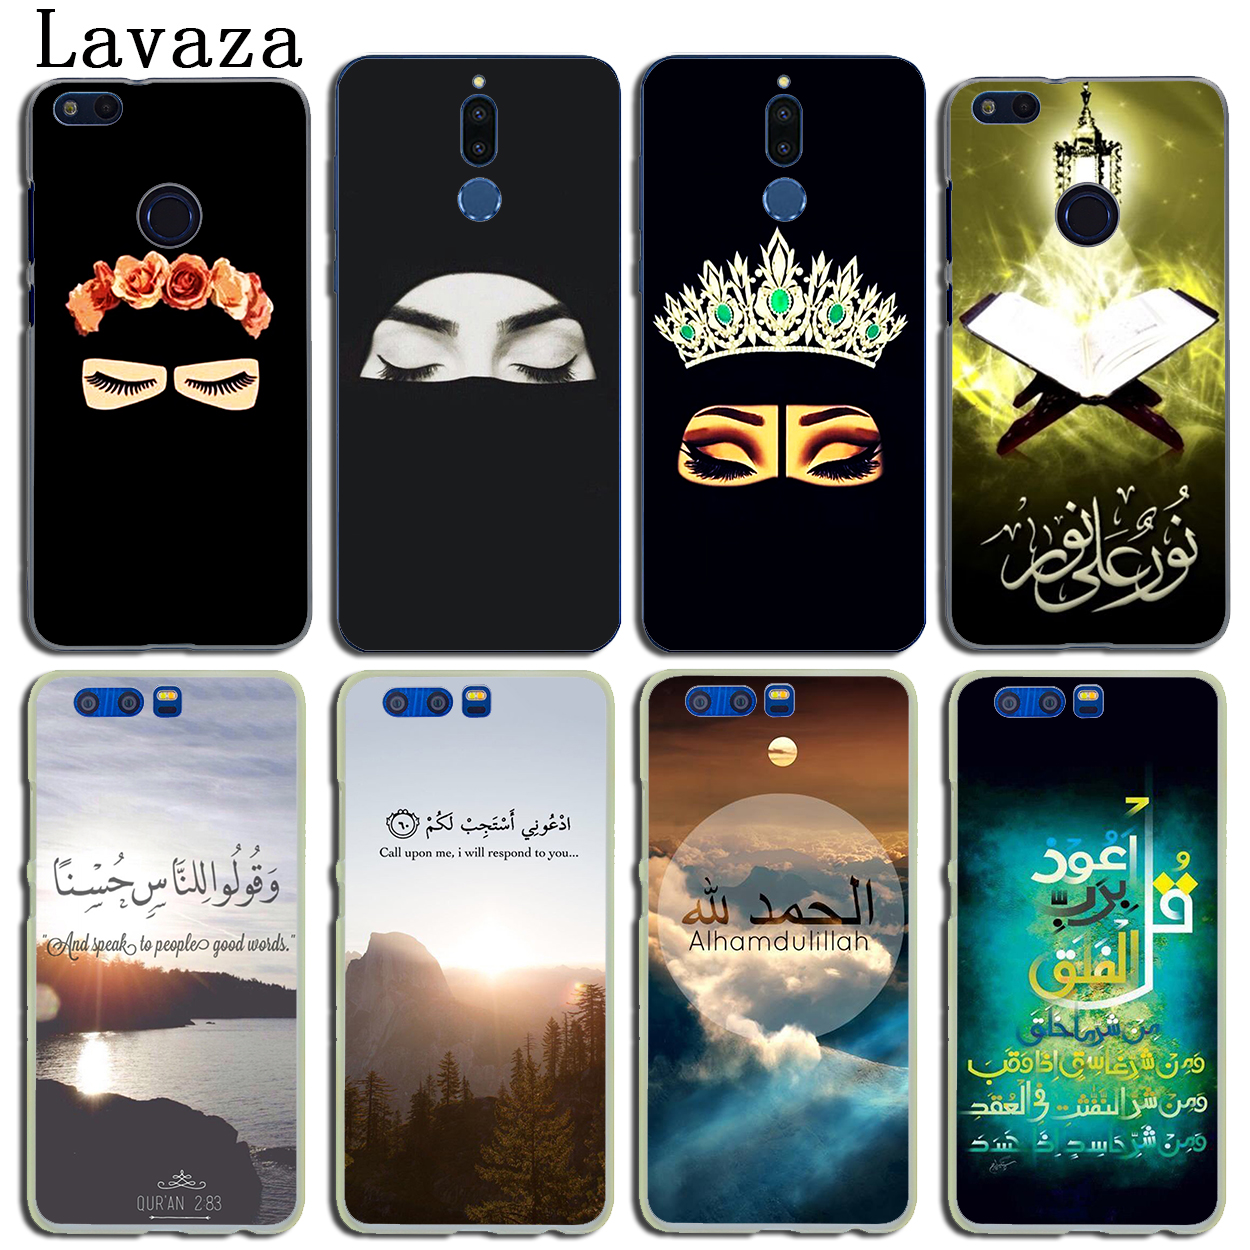 Arabic Quran Islamic Hard Phone Case For Huawei Y5 Y6 Y7 Y9 Prime 2017 2018 Mate 10 20 Lite Pro Nova 2i 3 3i Lite Phone Bags & Cases Cellphones & Telecommunications